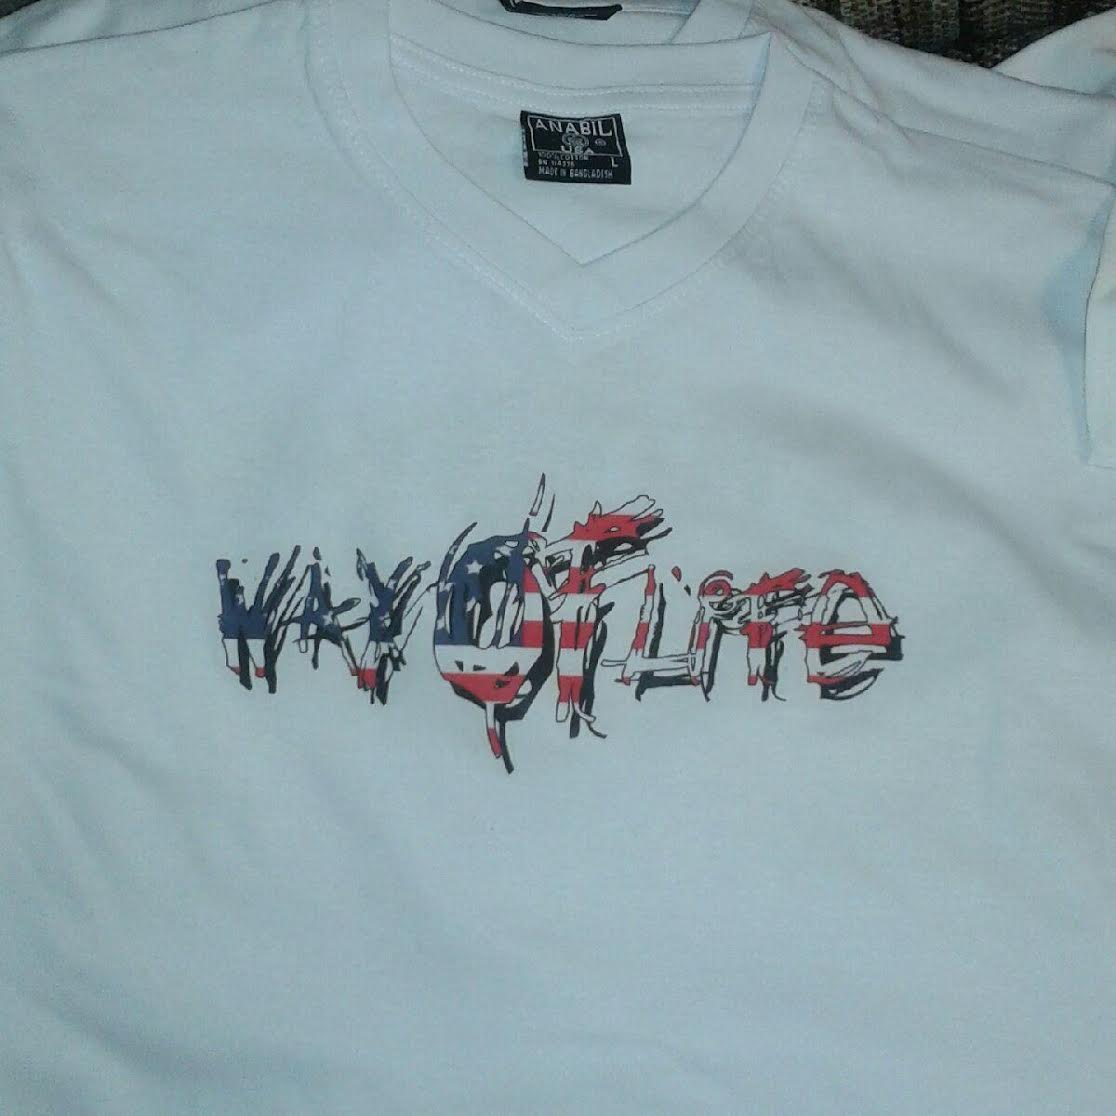 way-of-life-band-apparel-5